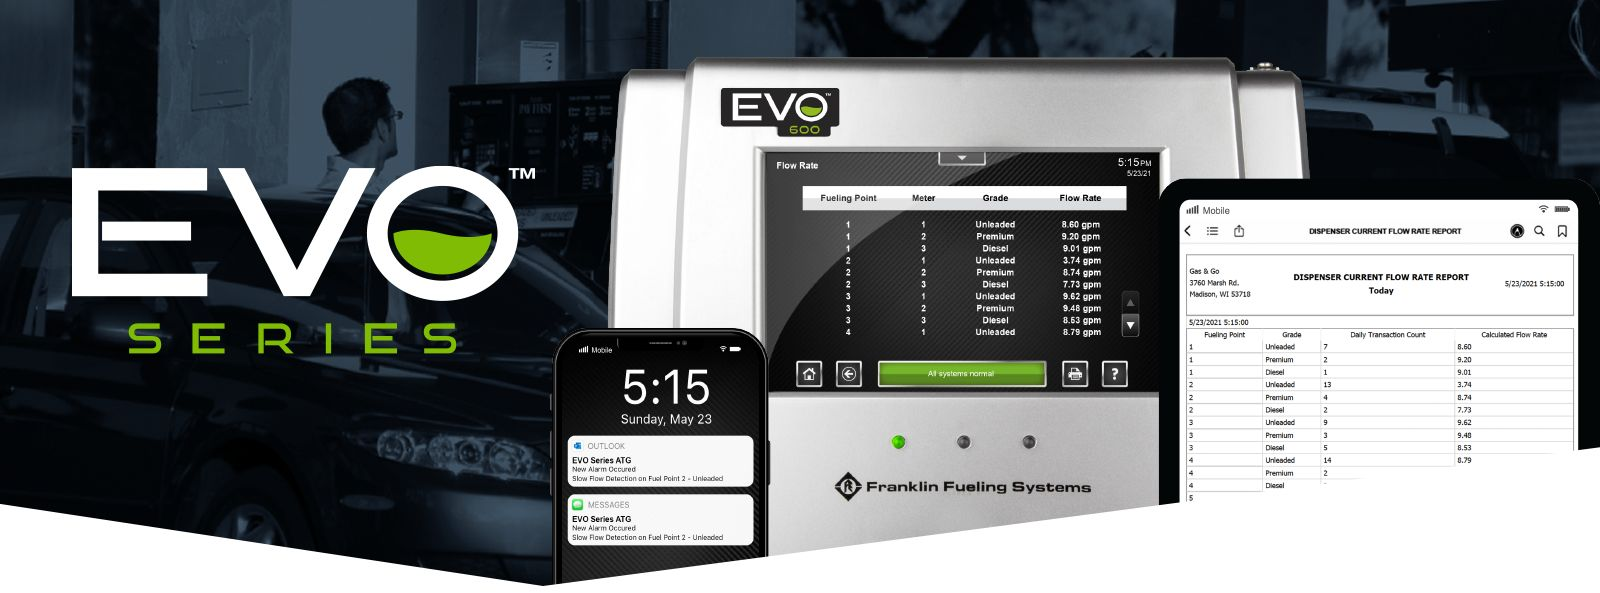 EVO - Flow Rate Monitoring - Landing Banner.psd